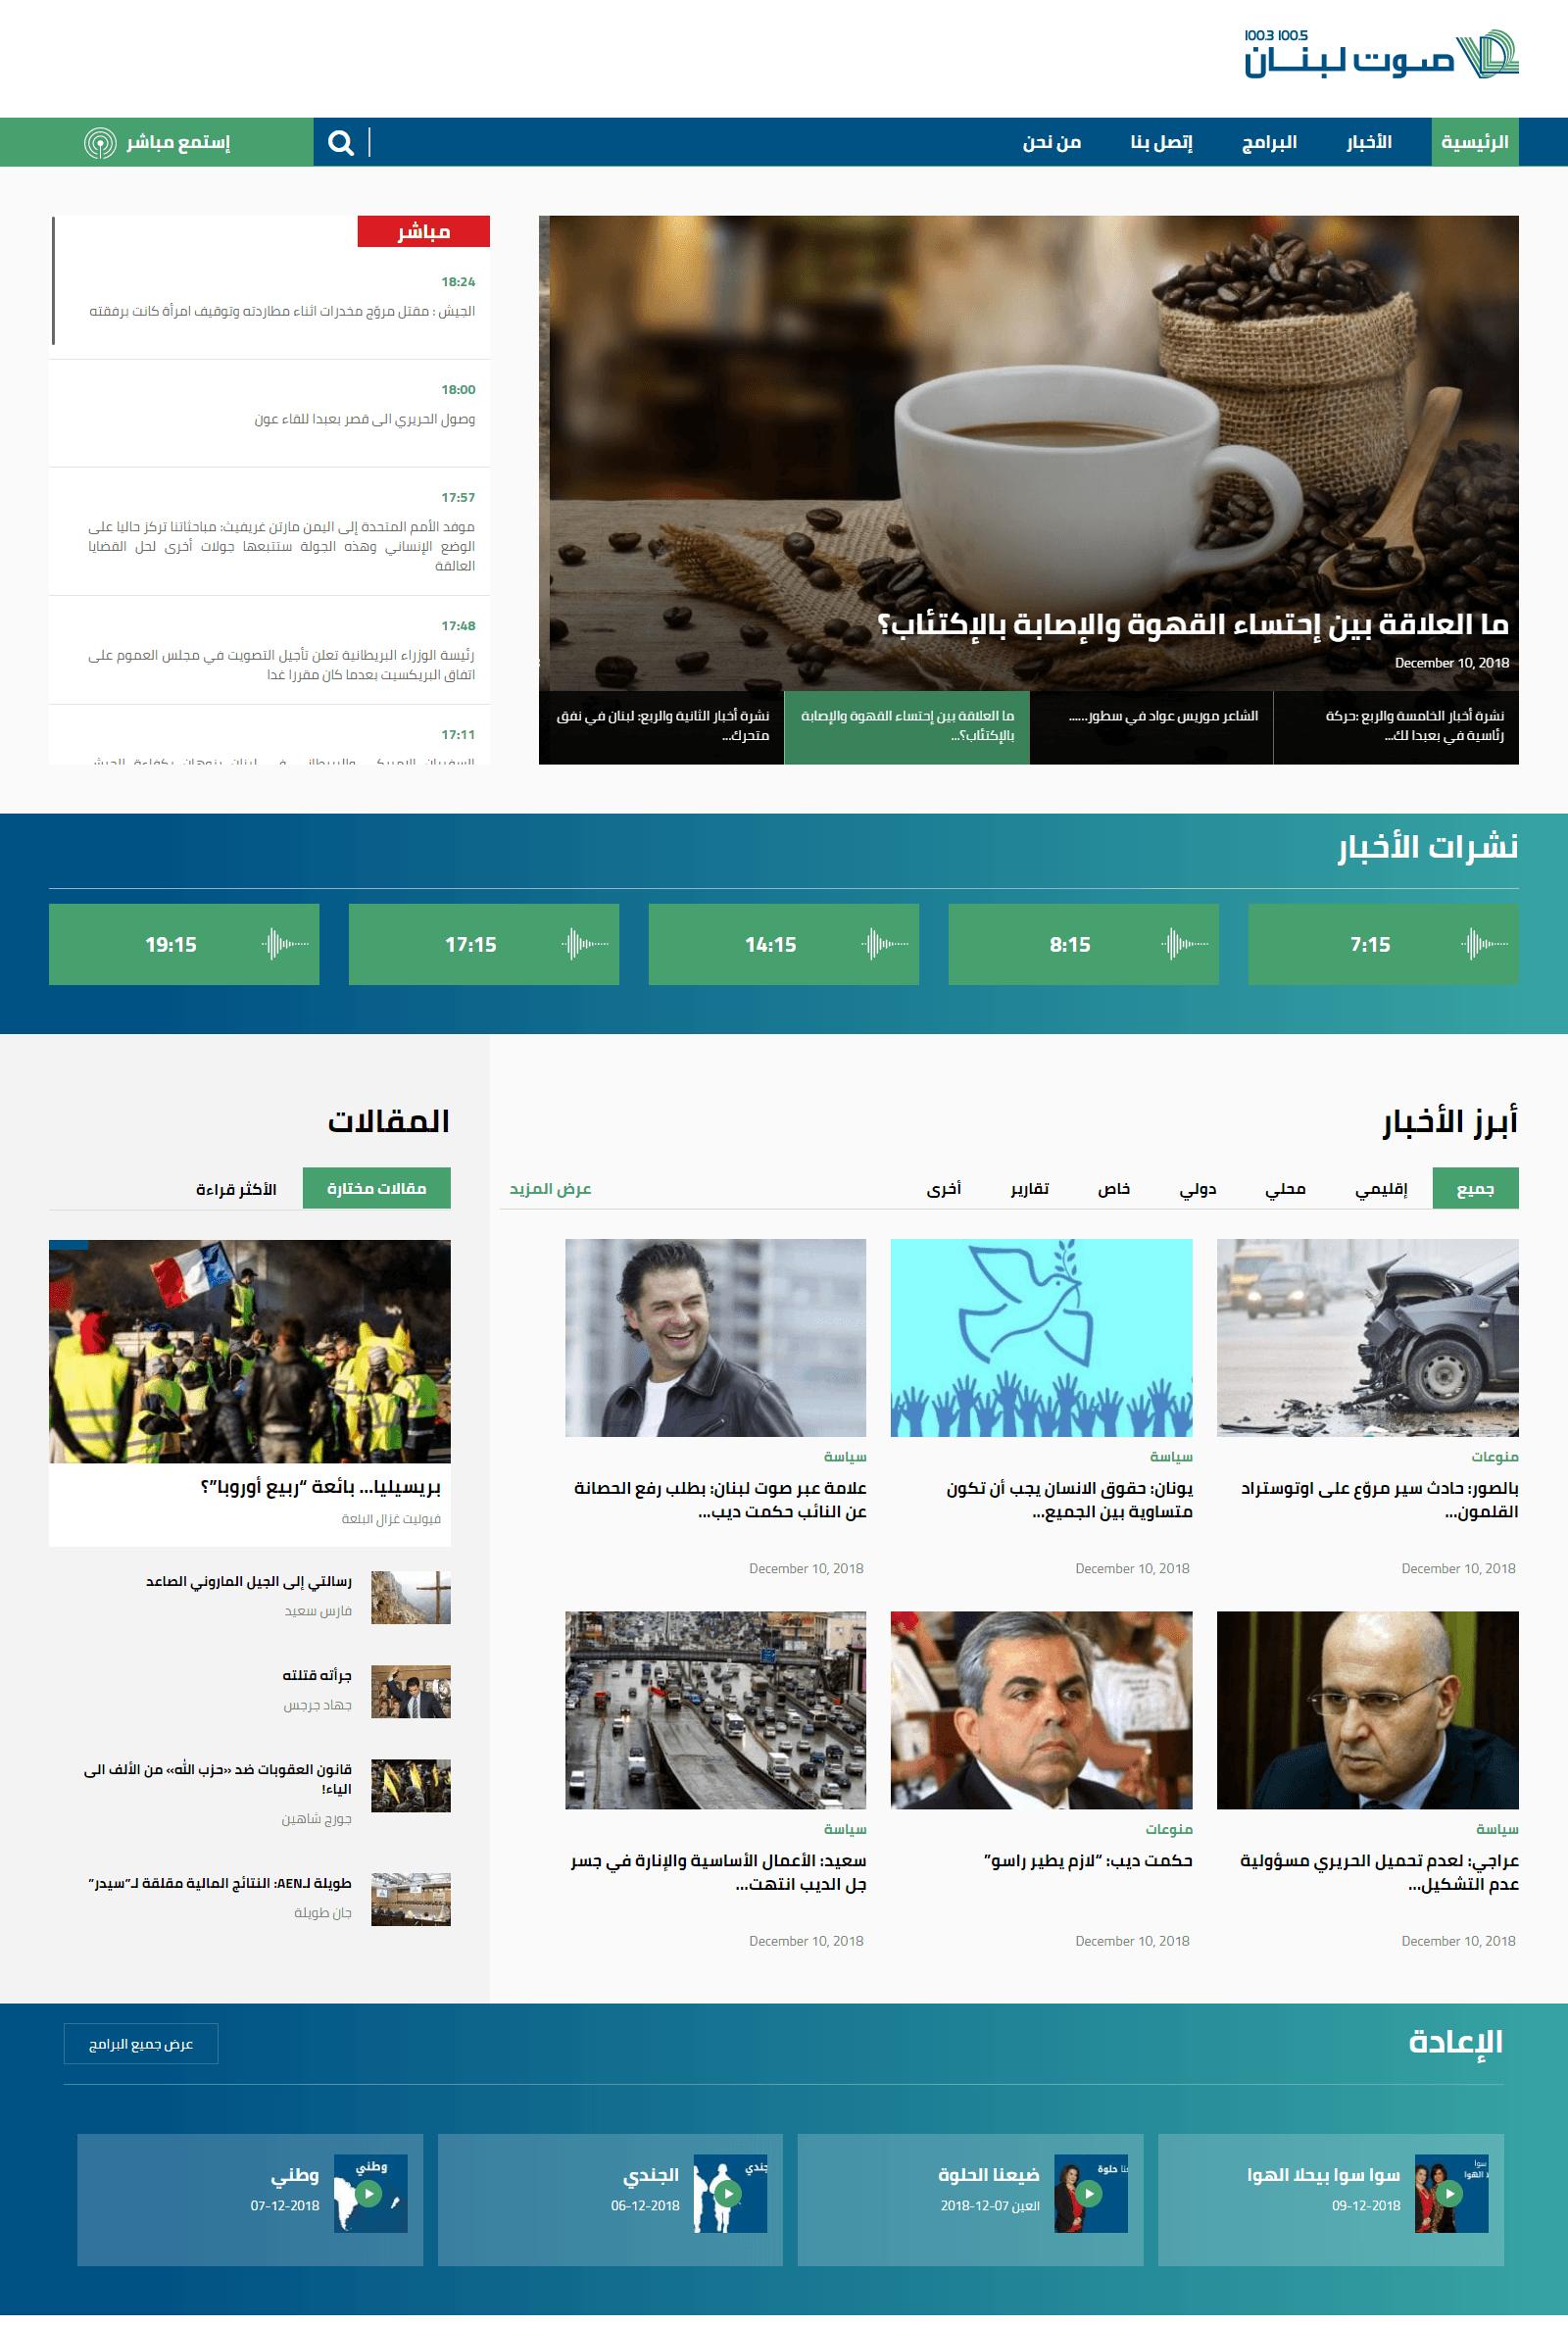 VDL (Voix du liban)